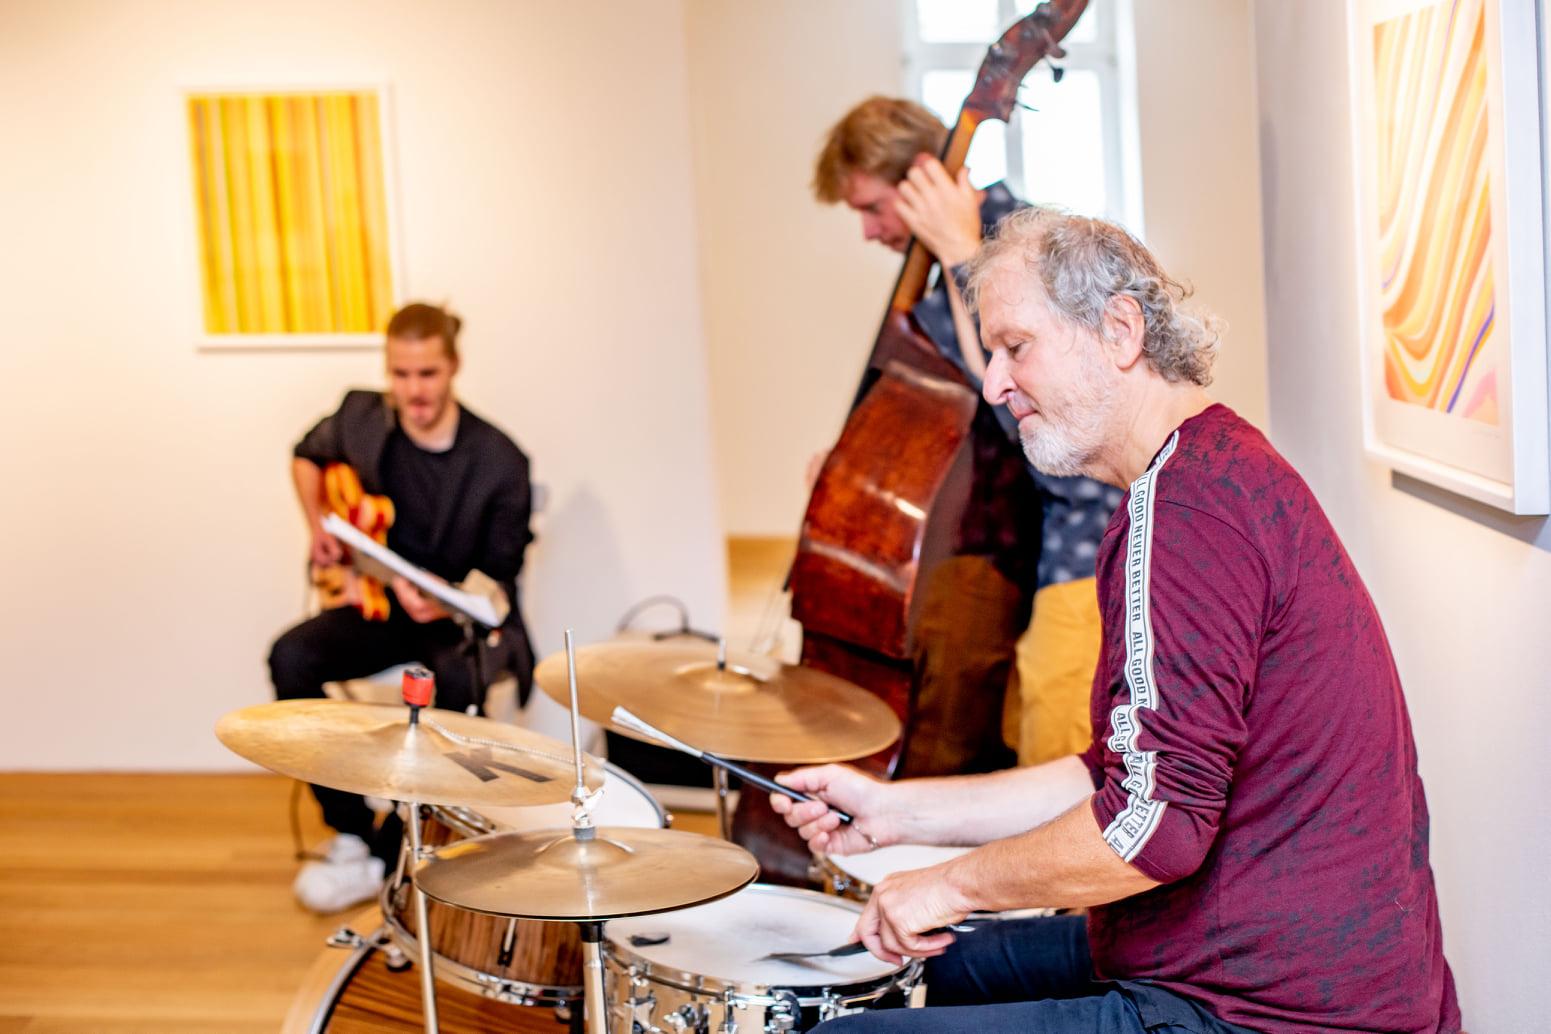 Galerie HAAS & GSCHWANDTNER, Ian Davenport COLOUR EXPLOSION ensemble021